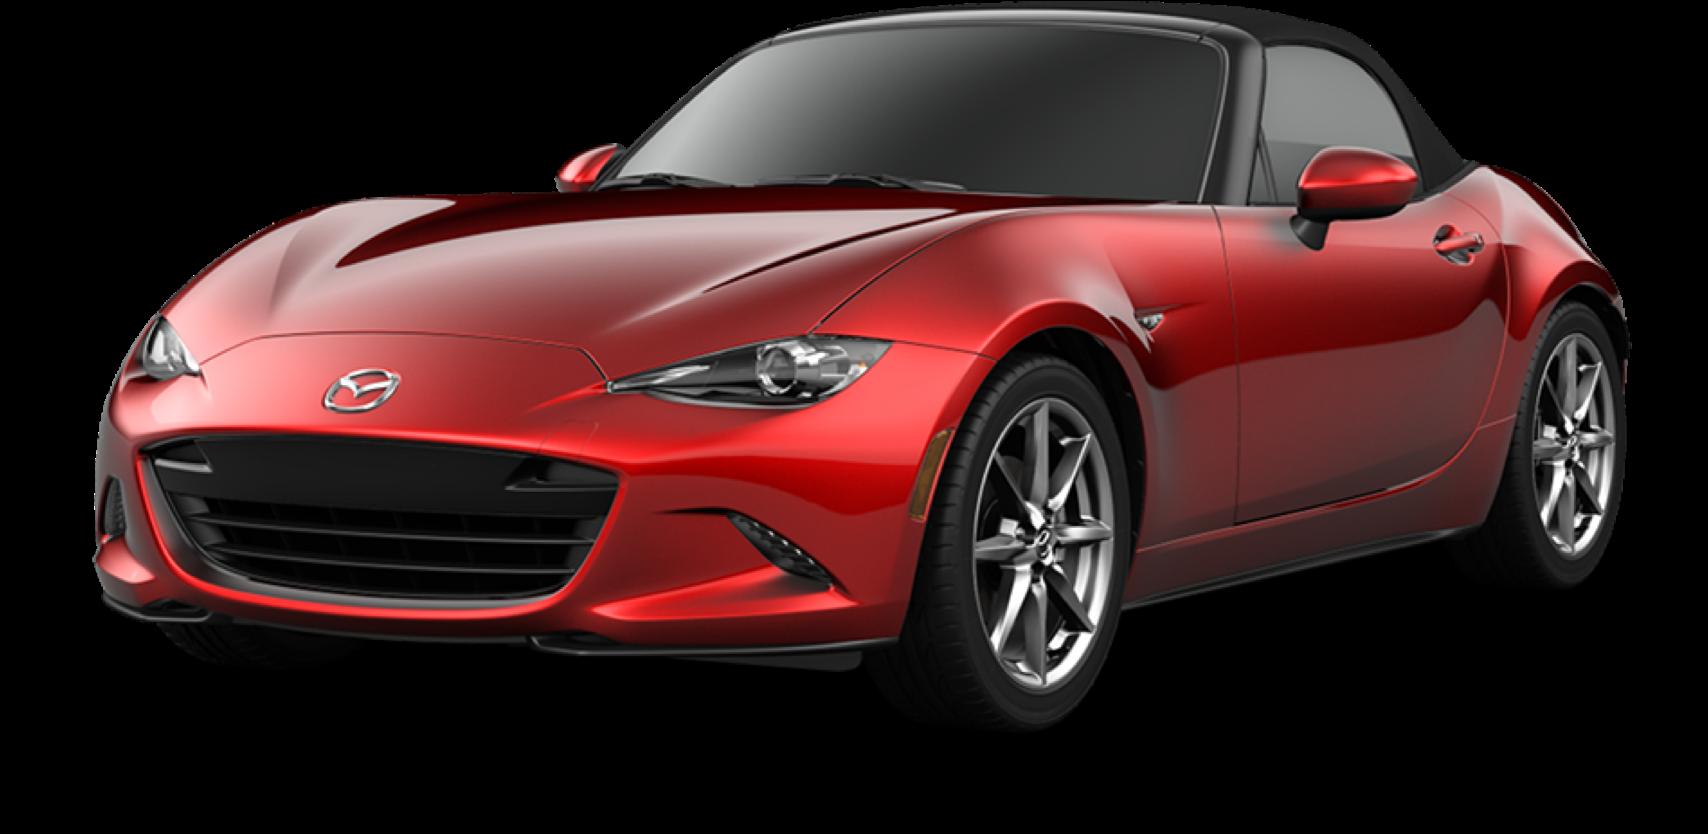 2021 Mazda MX-5 Miata, Soul Red Crystal Metallic